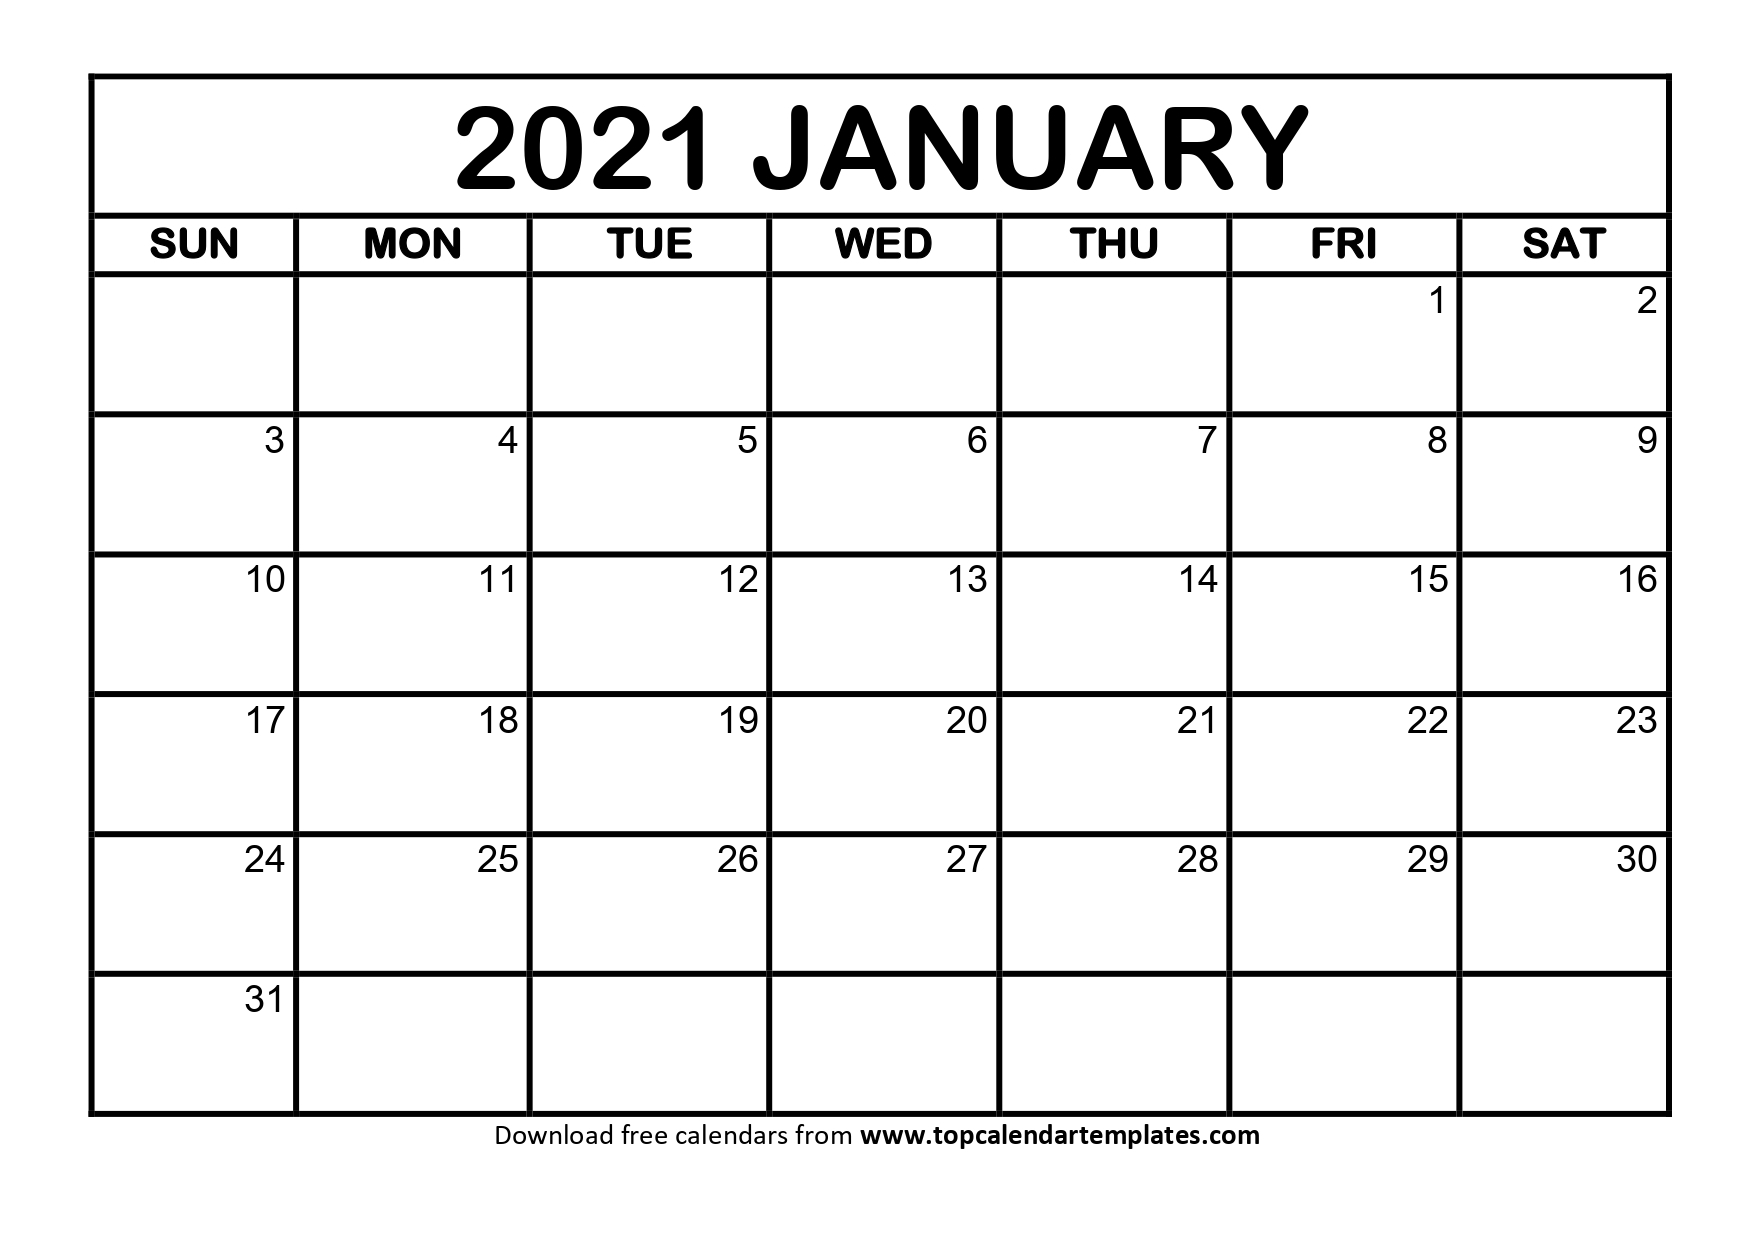 January 2021 Printable Calendar Editable Templates 1